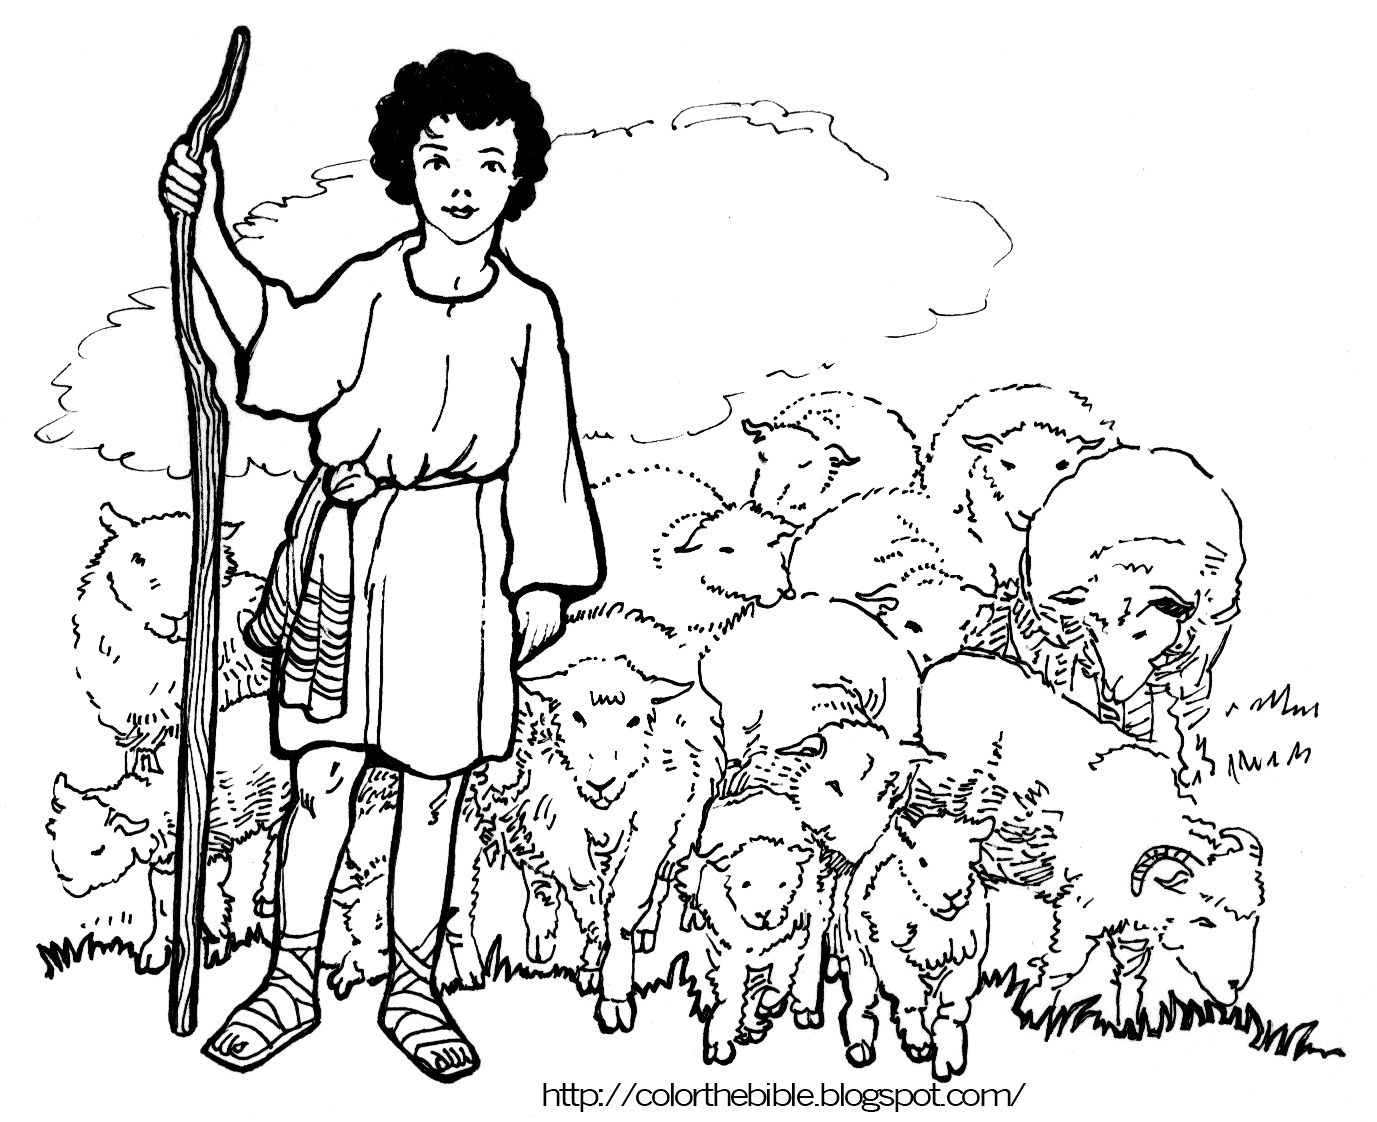 Clipart Shepherd Boy.